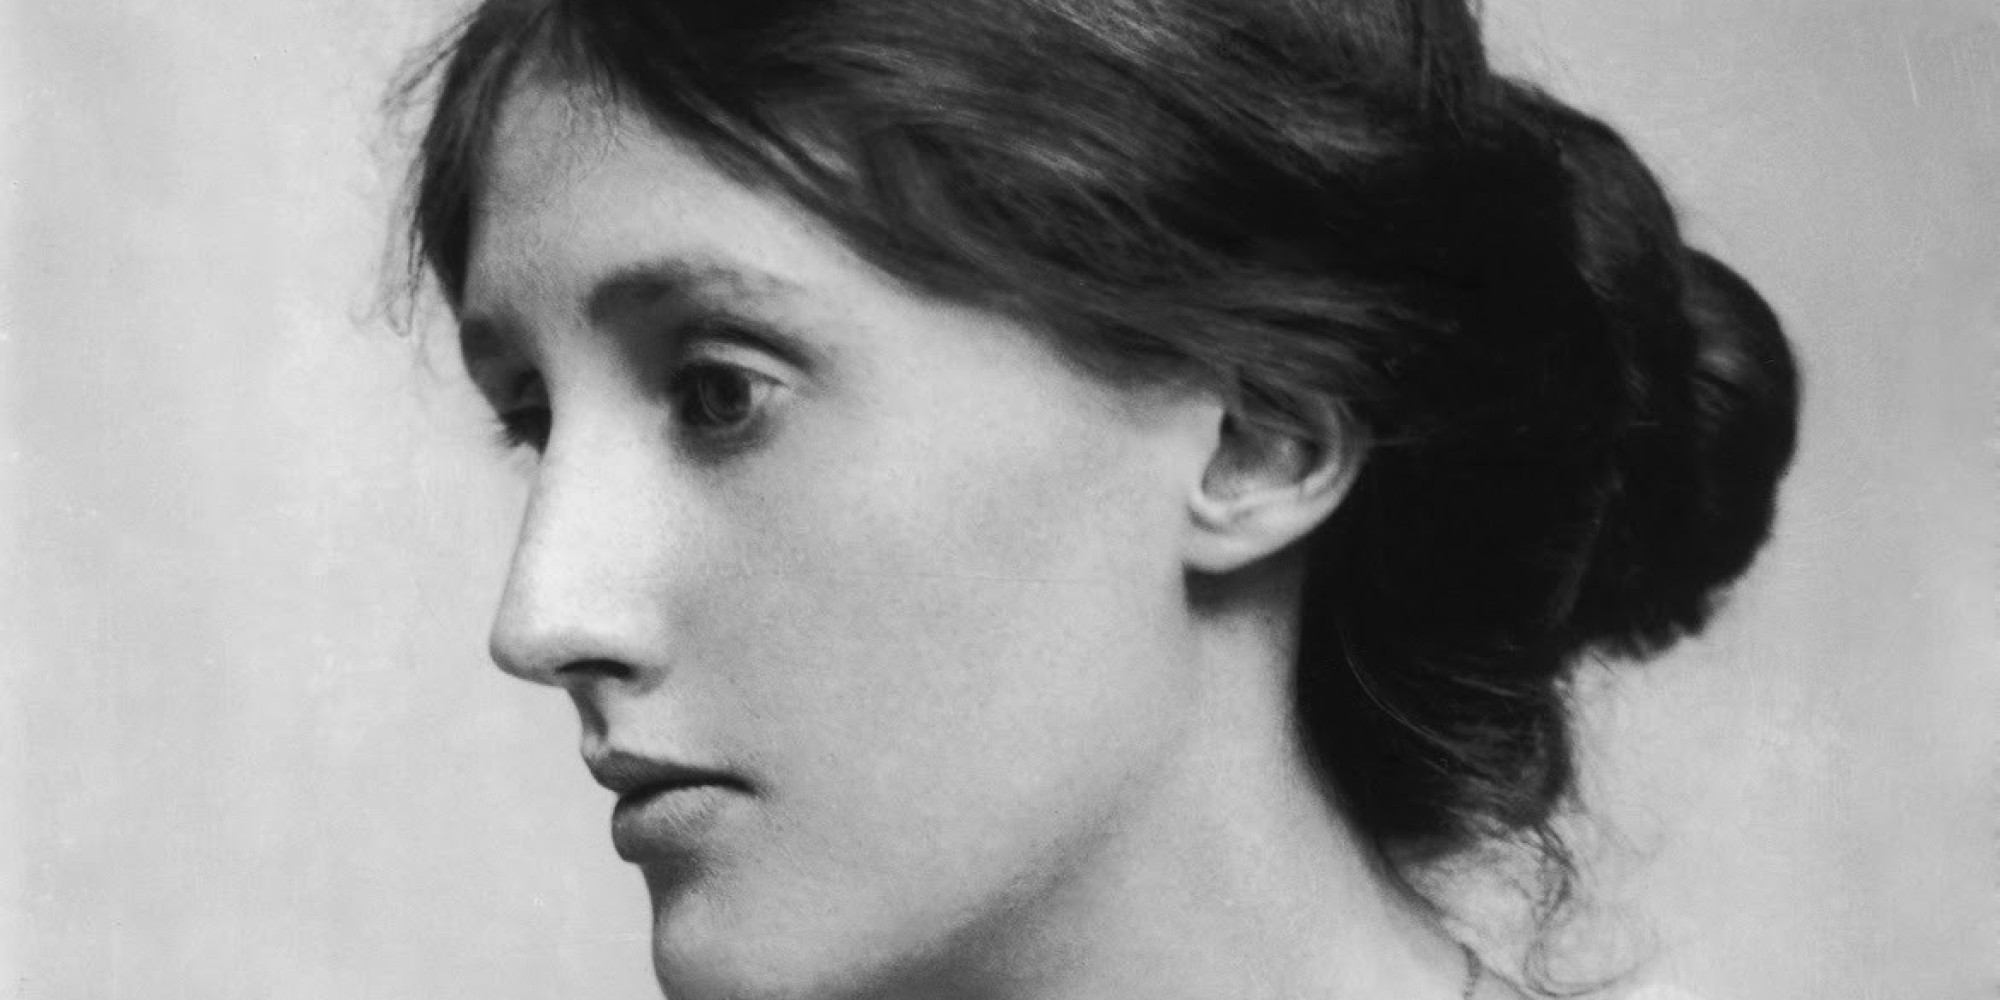 「Virginia Woolf」の画像検索結果